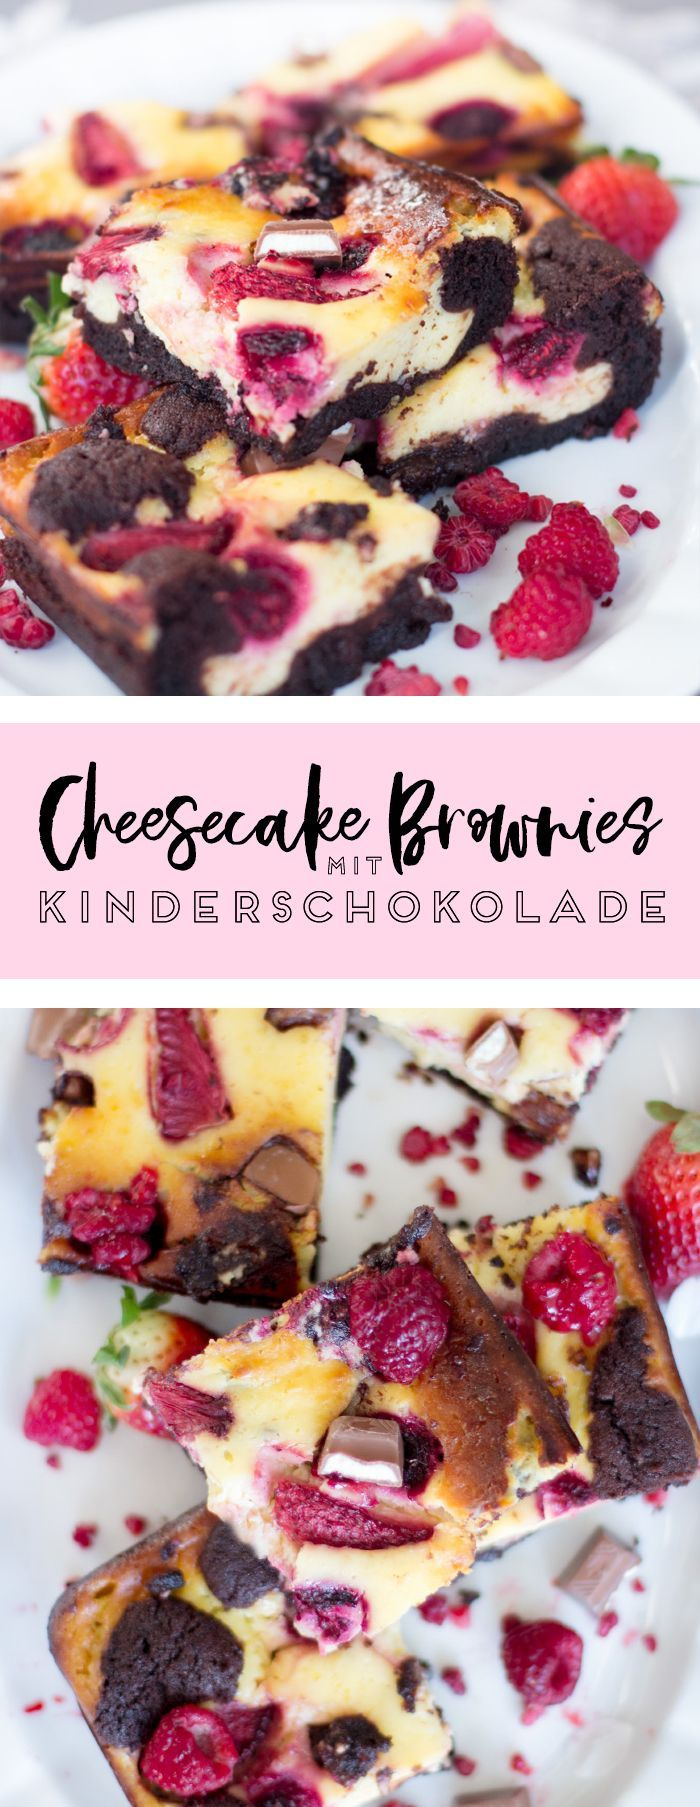 Cheesecake Brownies Mit Beeren Und Kinderschokolade Backen Fur